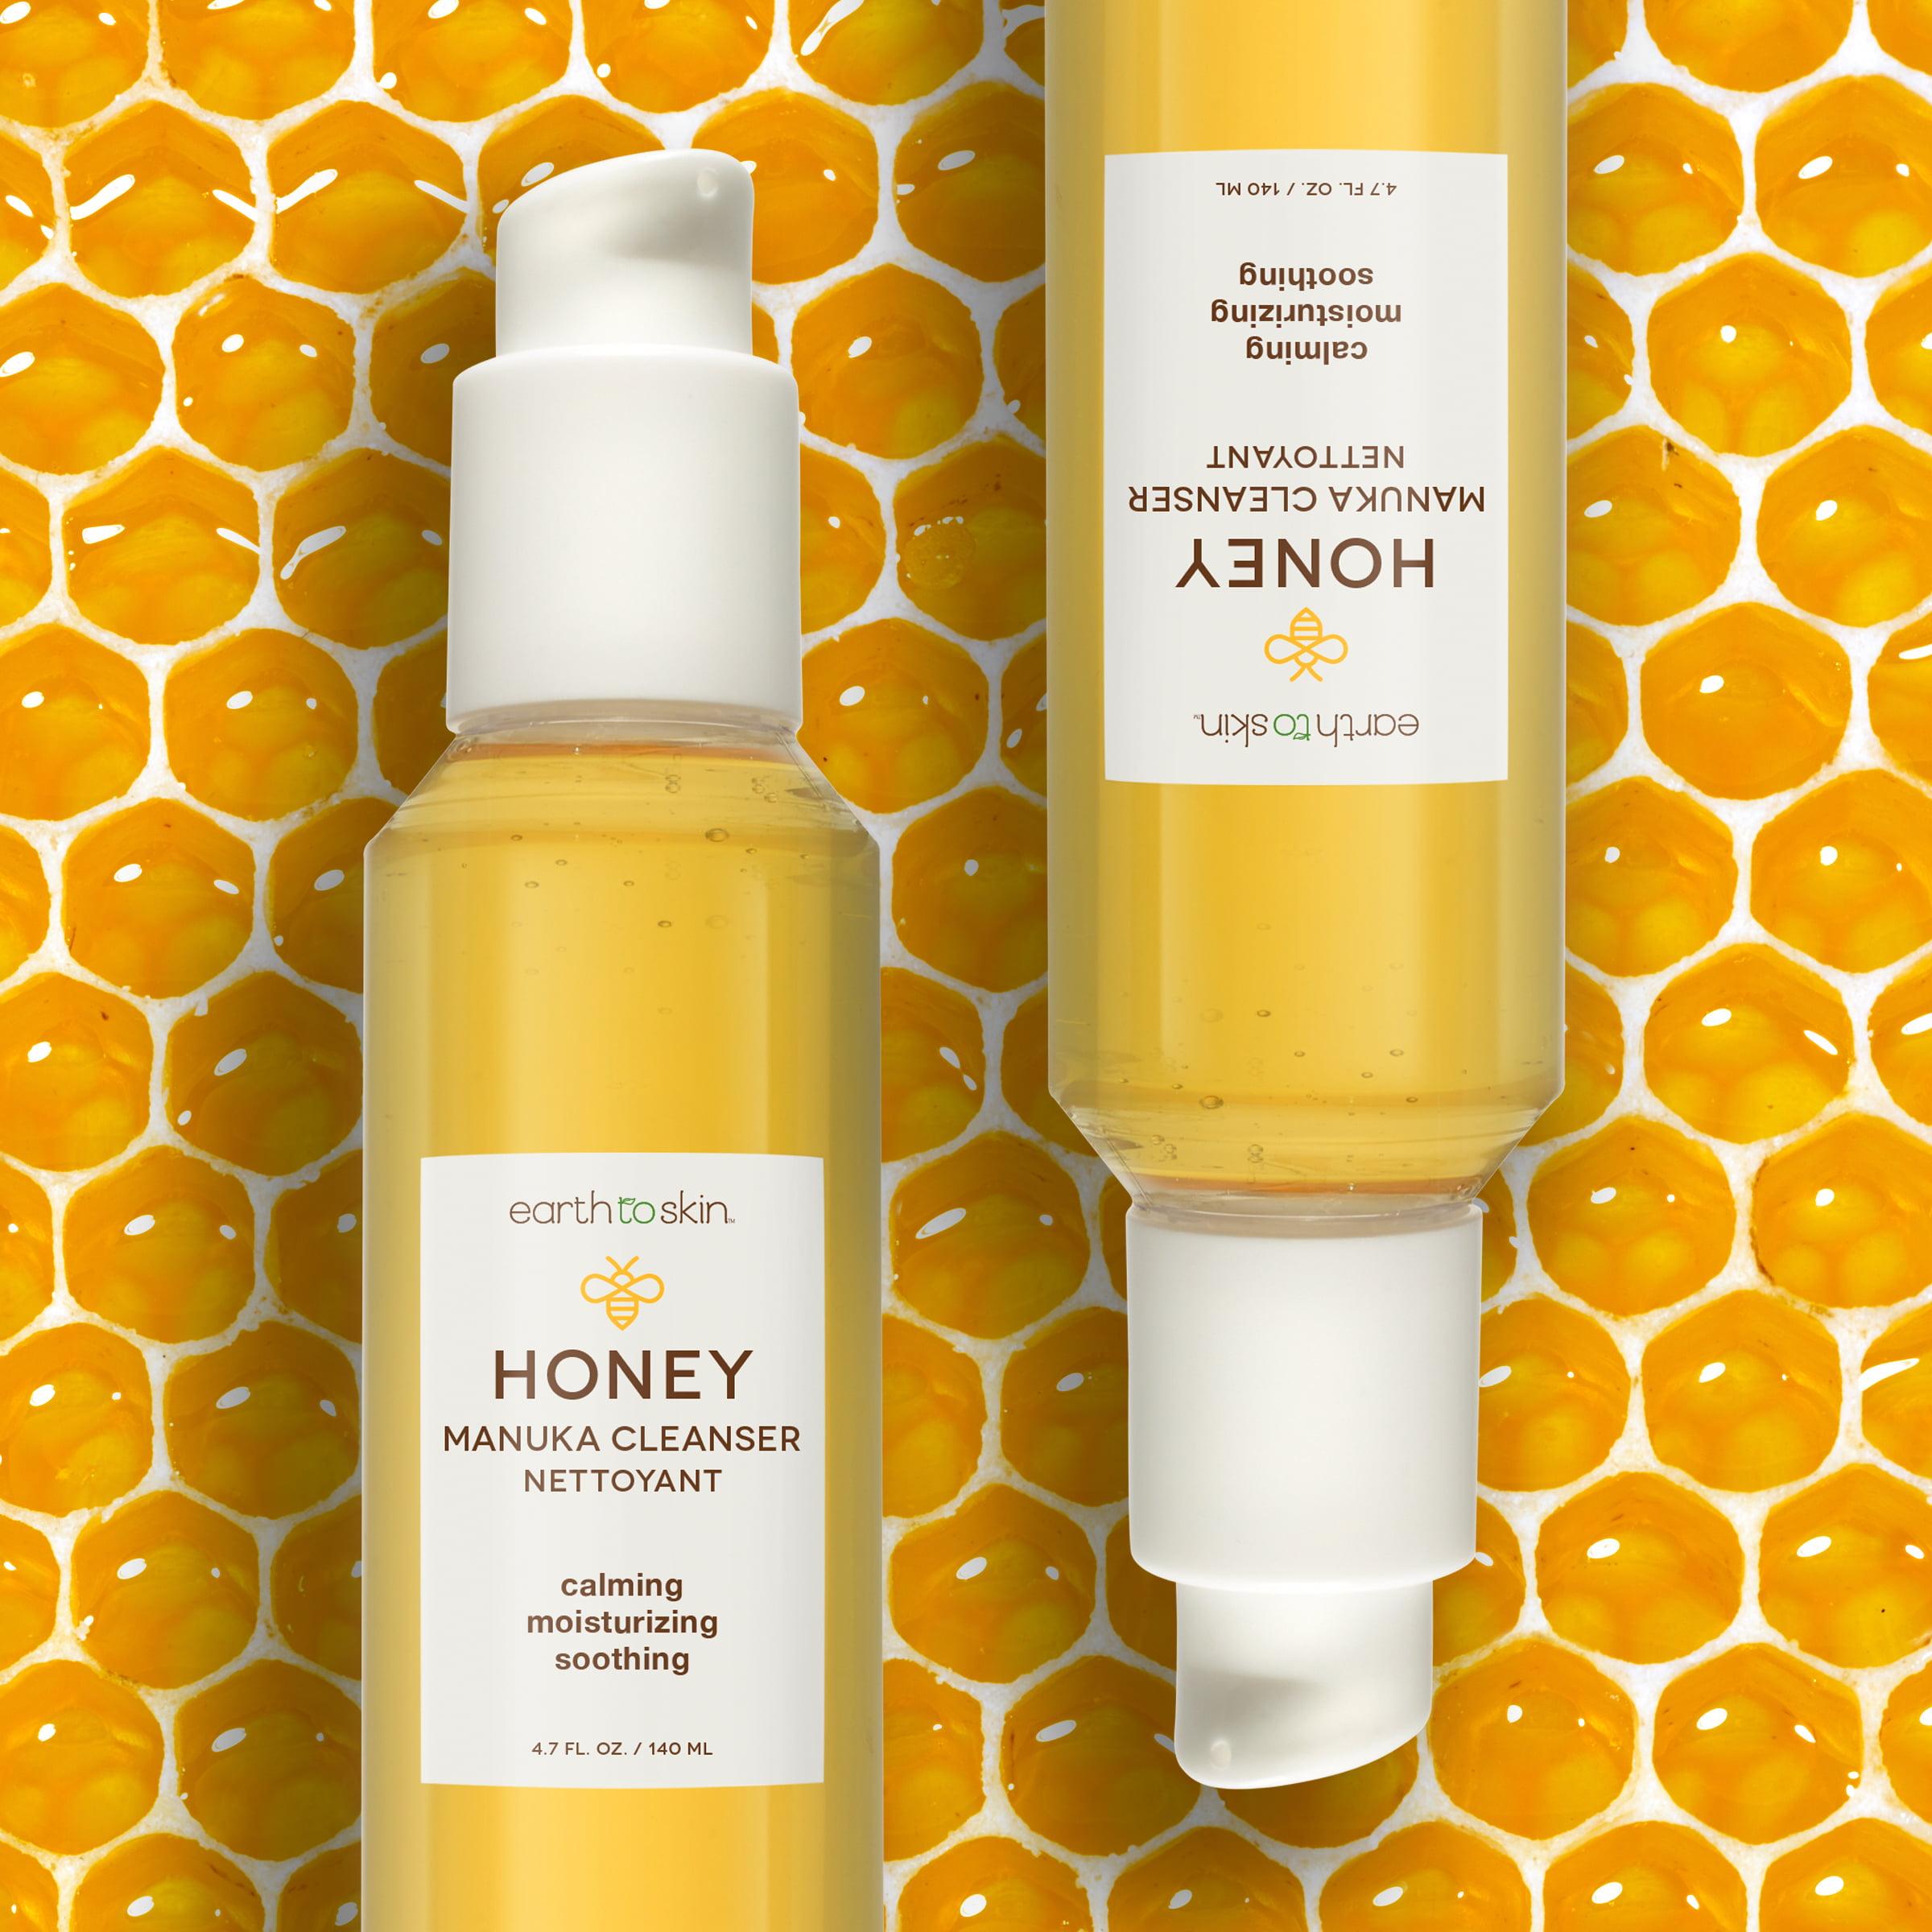 Earth To Skin Honey Manuka Calming Face Cleanser 4 74 Oz Walmart Com Walmart Com